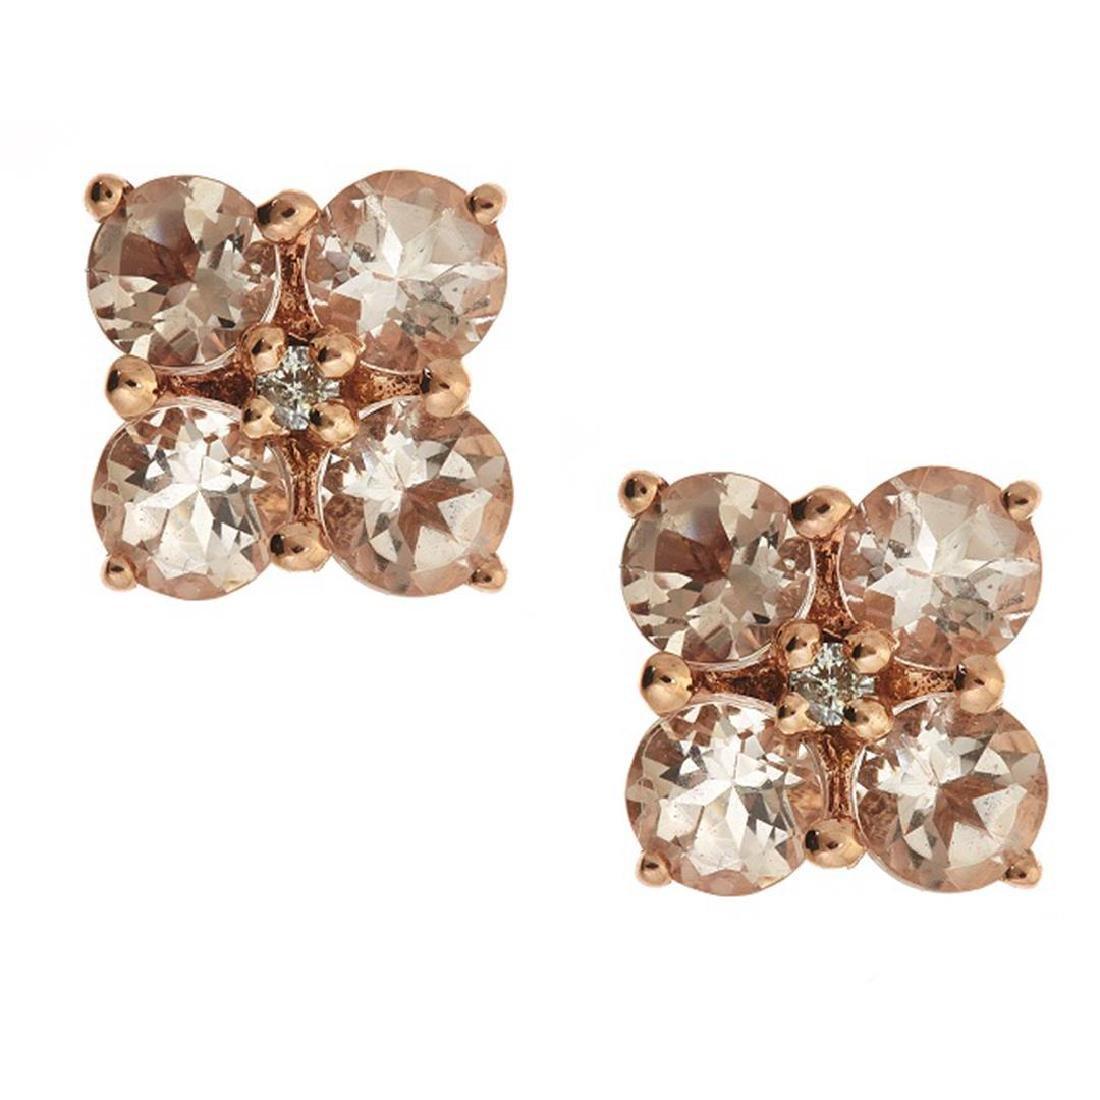 1.45 ctw Morganite and Diamond Earrings - 14KT Rose